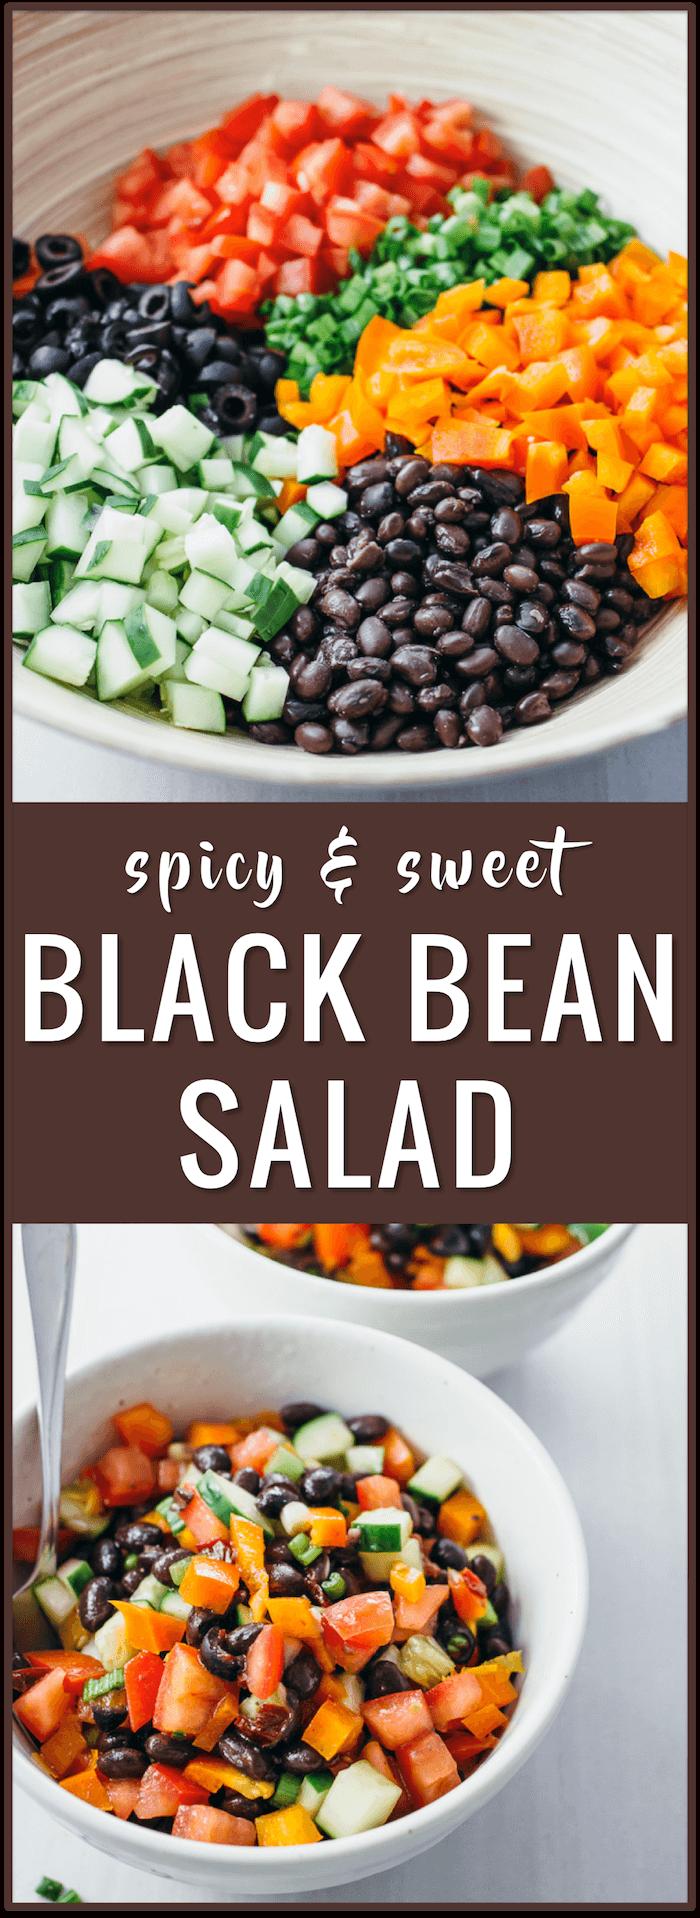 easy salad recipe, spicy sweet black bean salad, chipotle adobo sauce, honey, scallions, tomatoes